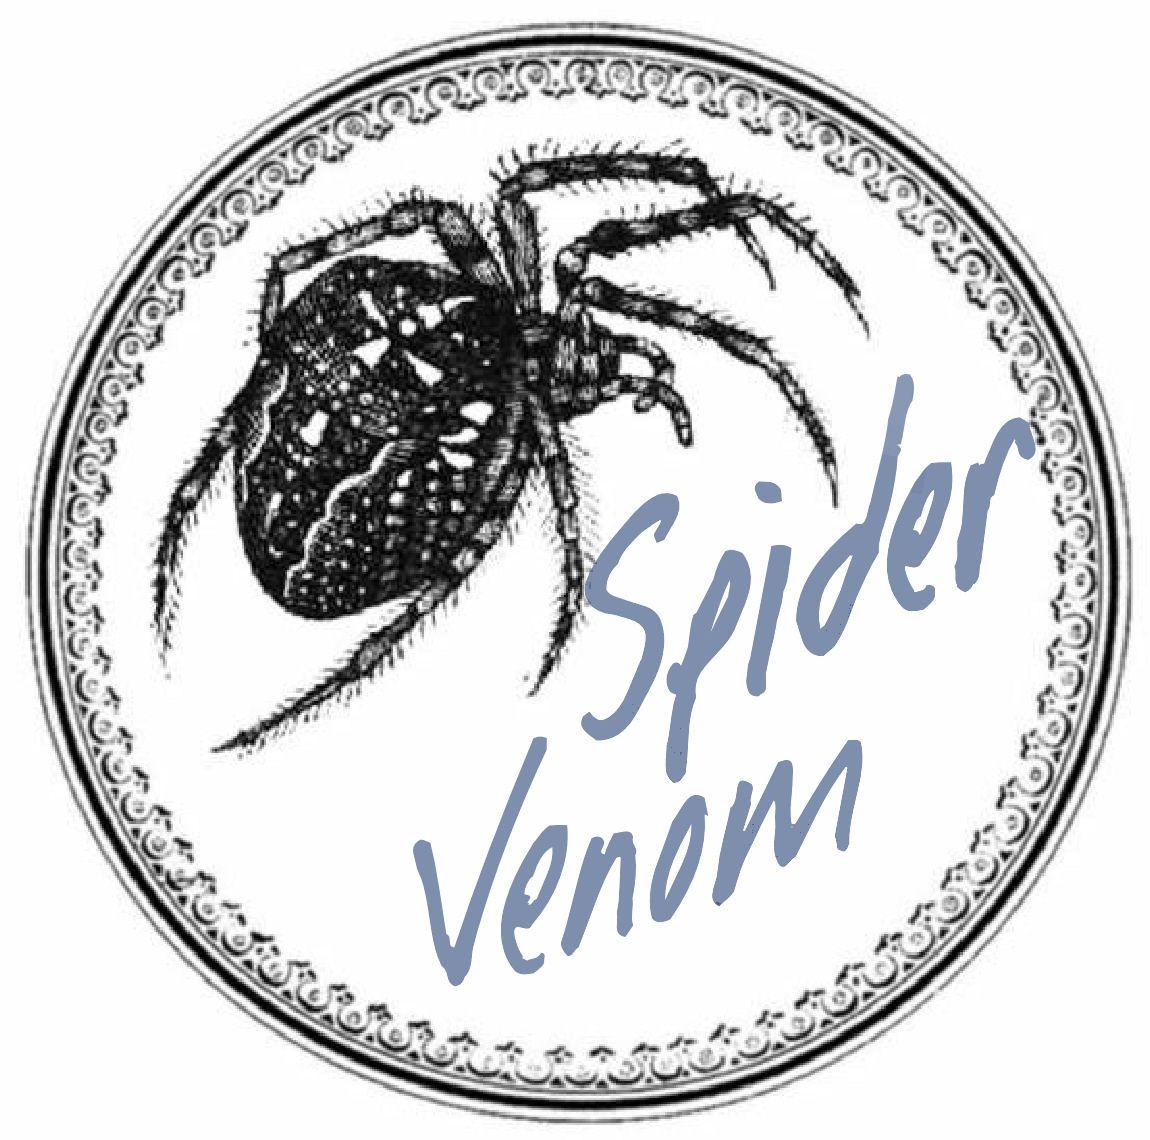 Label Bottle Halloween Apothecary Spider Venom Poison Printable